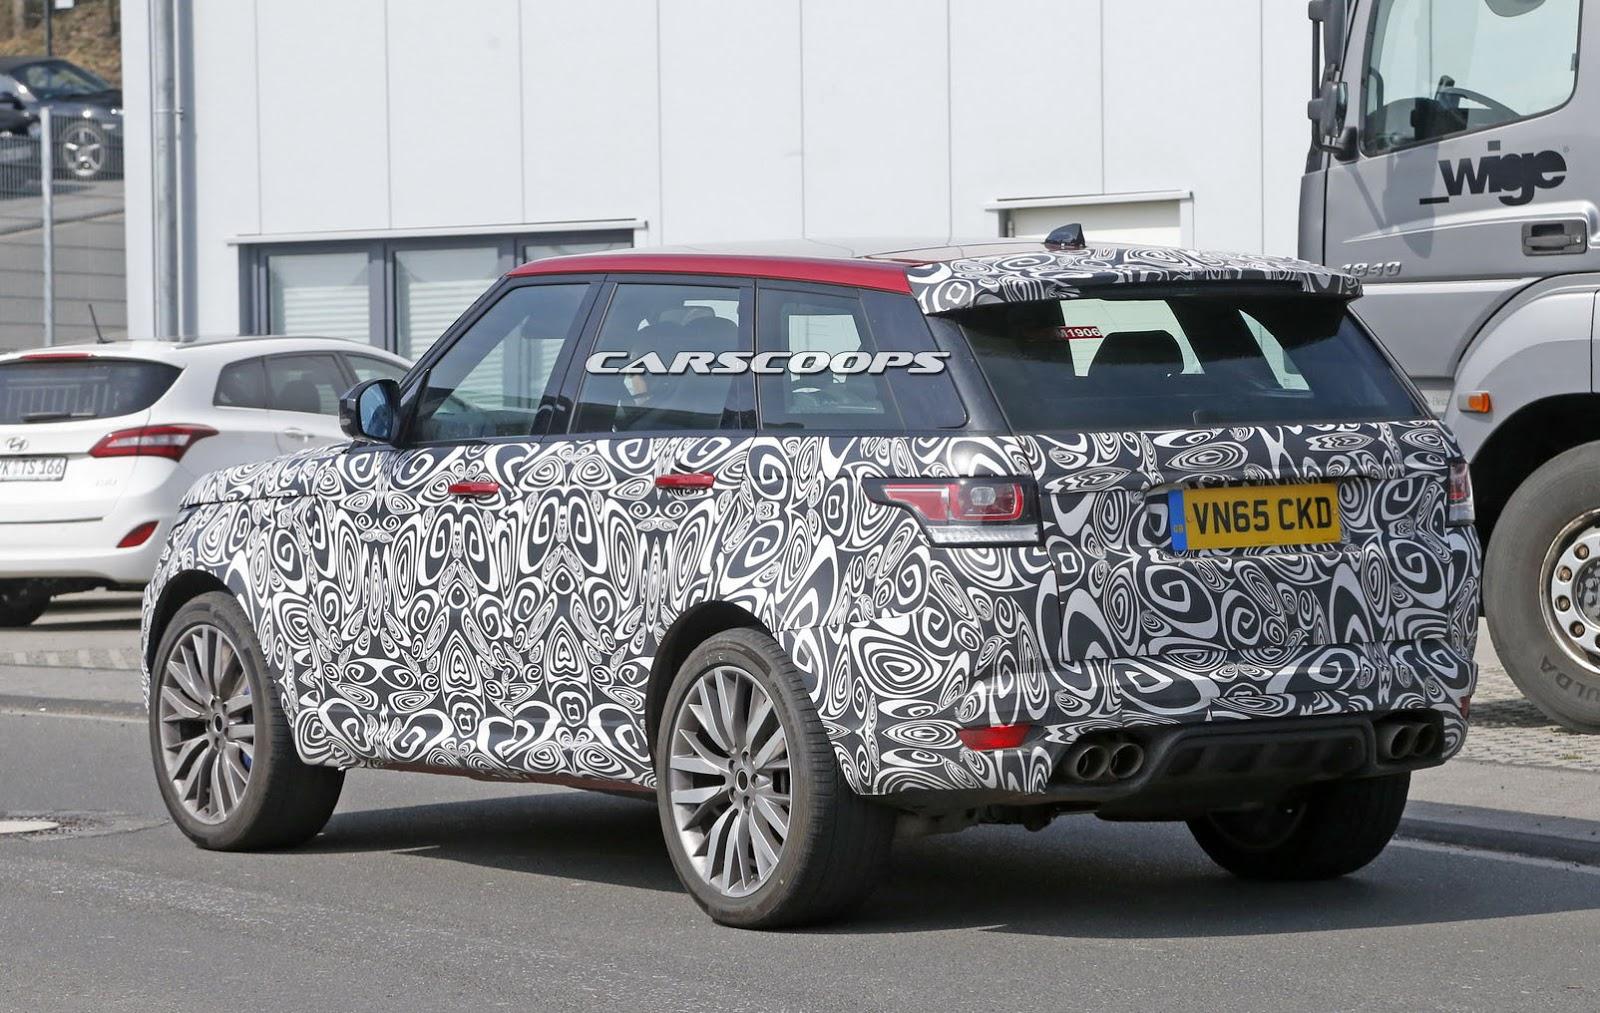 2017 Land Rover Range Rover Sport 5 0 L V8 Supercharged >> Spied: 2017 Range Rover Sport SVR Facelift To Get A Power ...